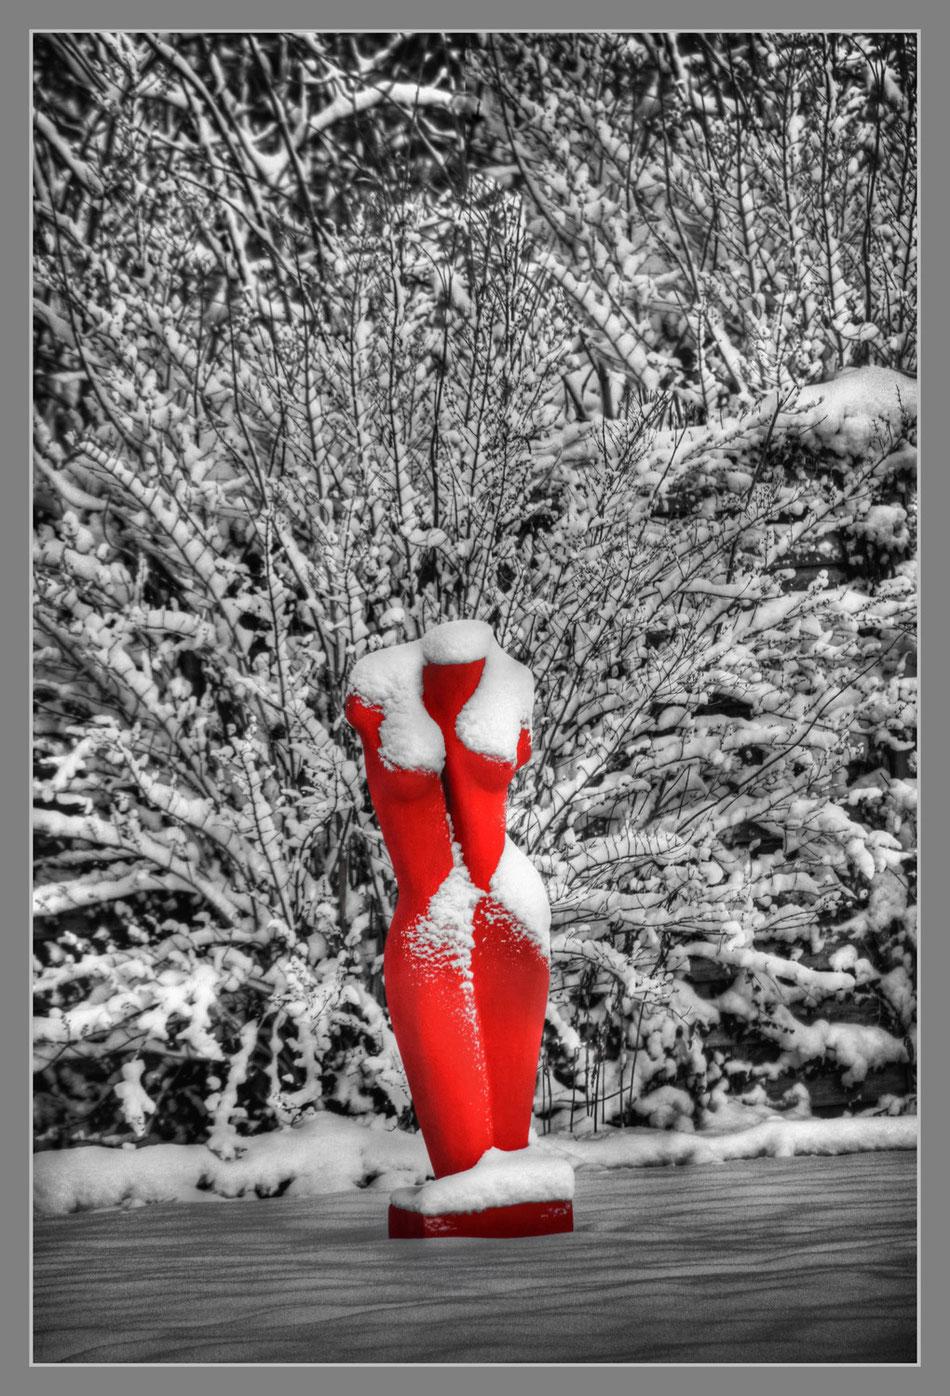 rote venus im schnee